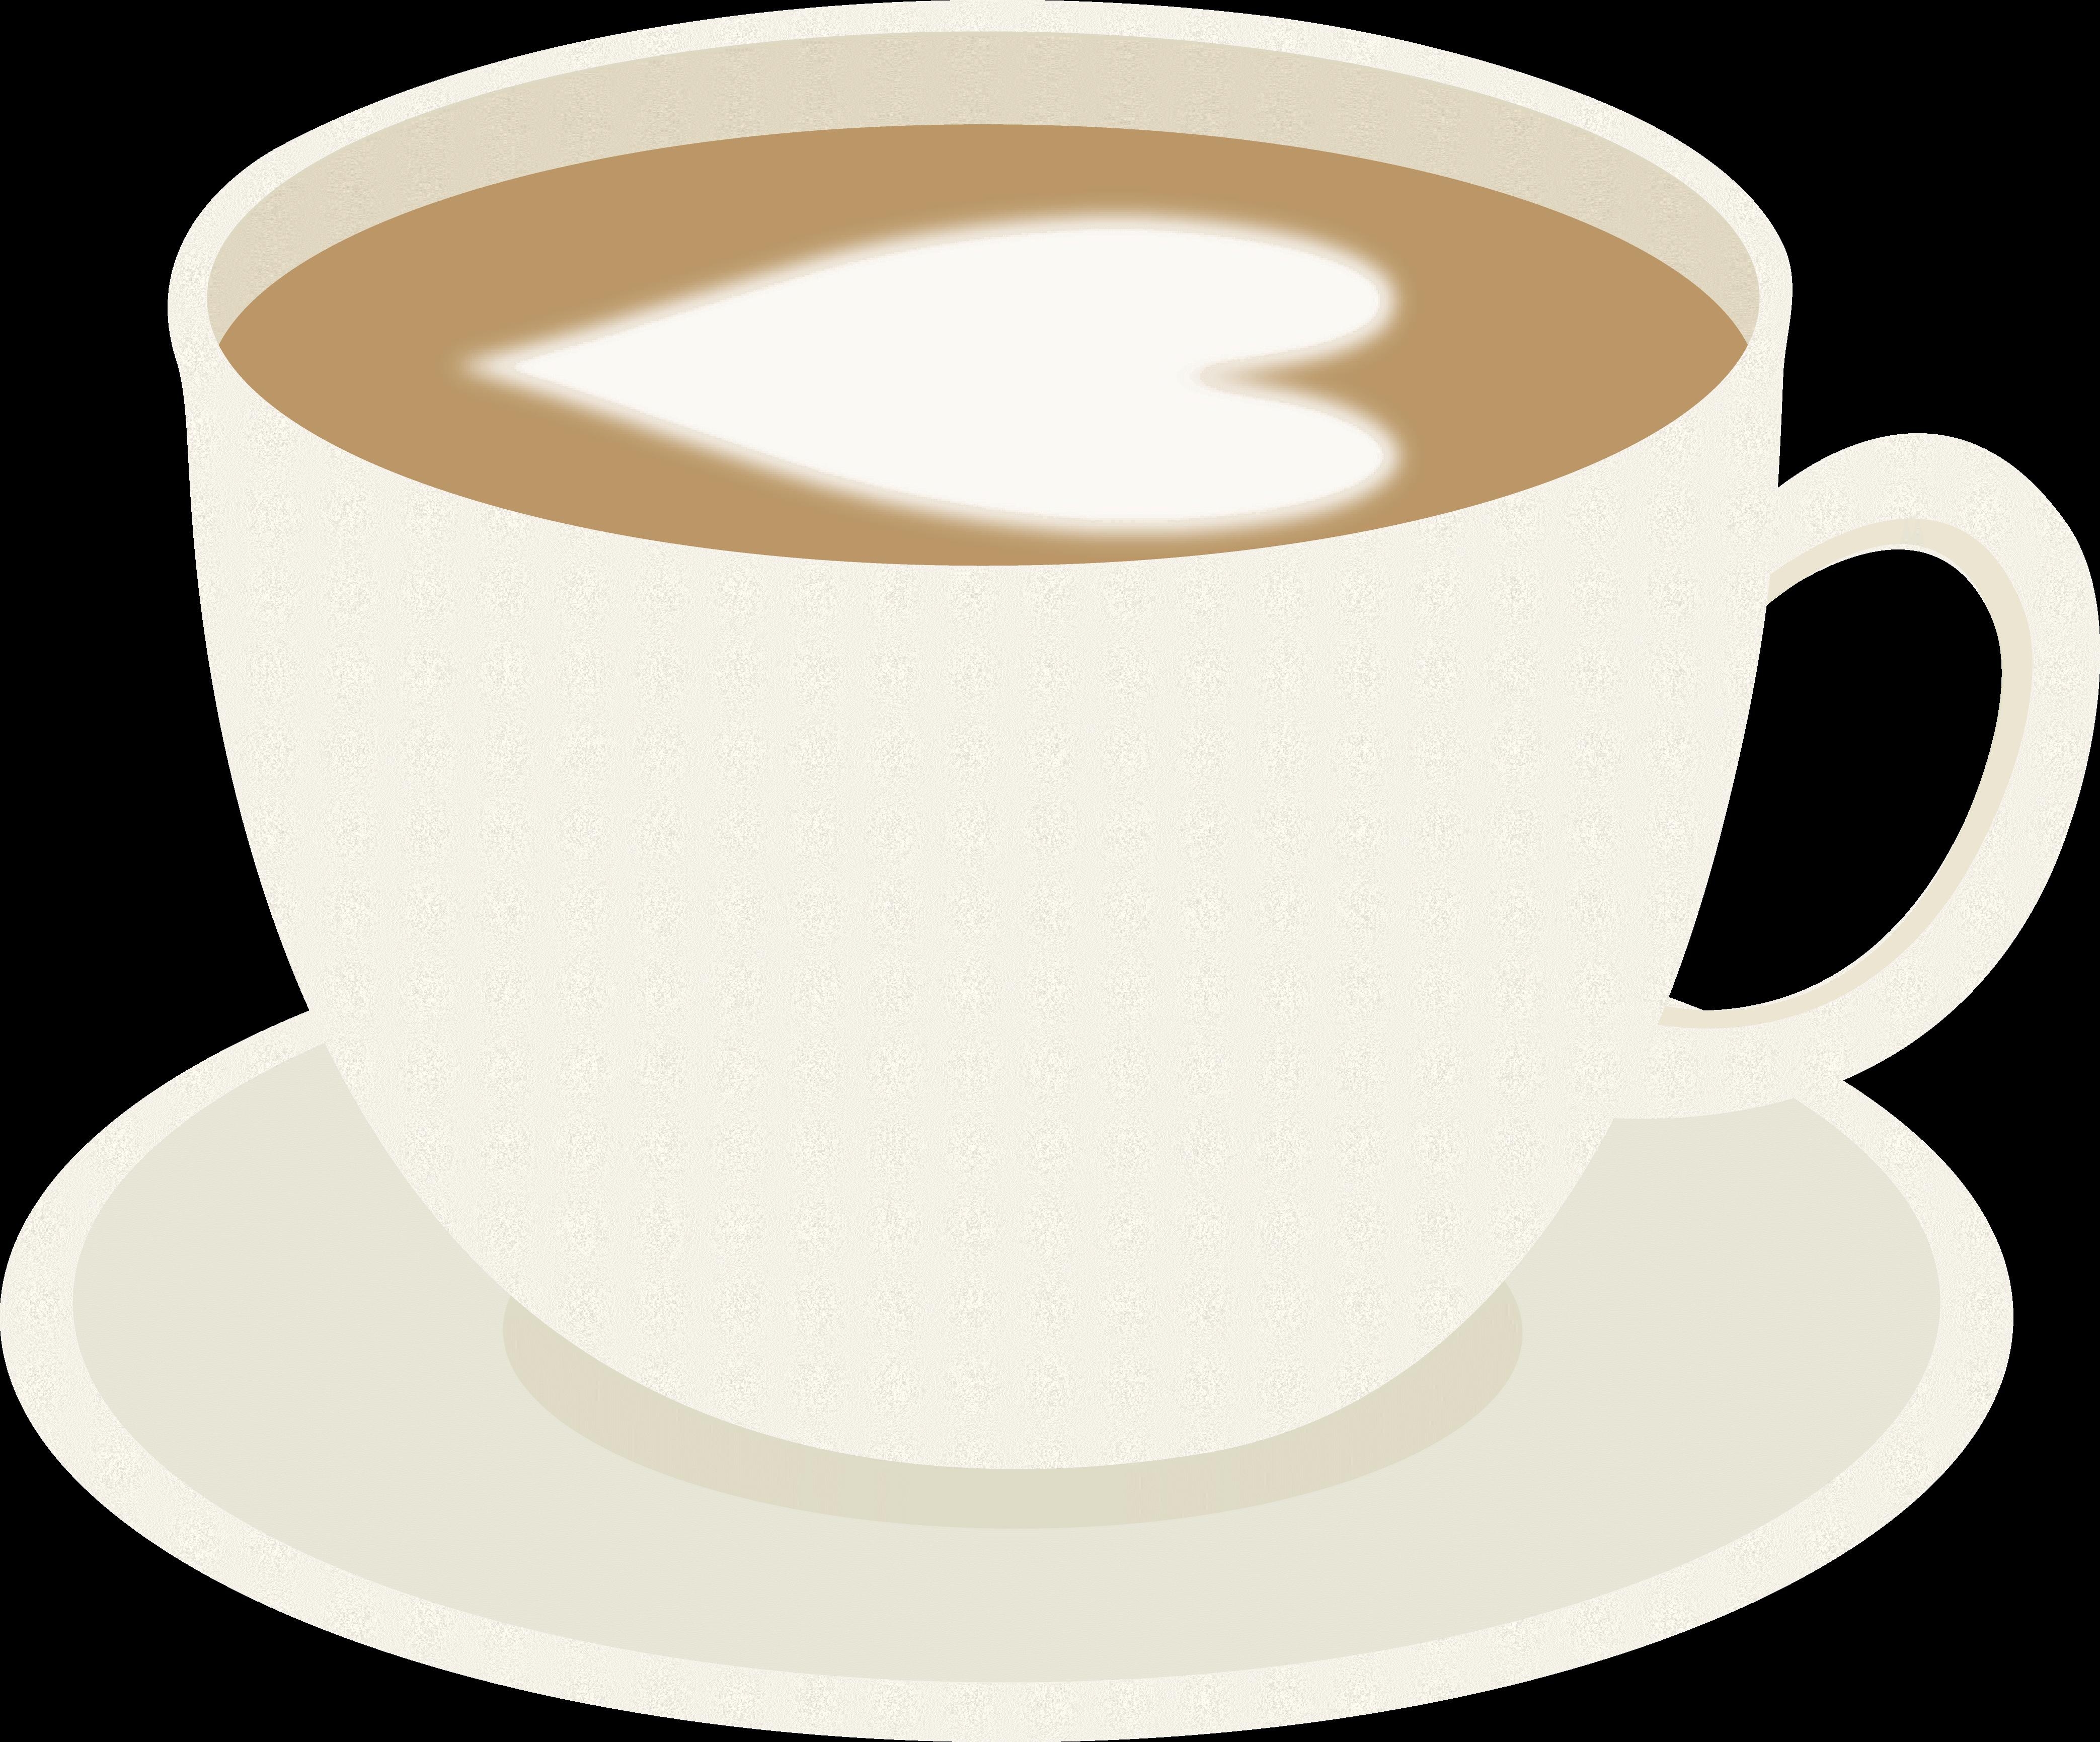 Mug clipart cute mug. Coffee heart cliparts zone